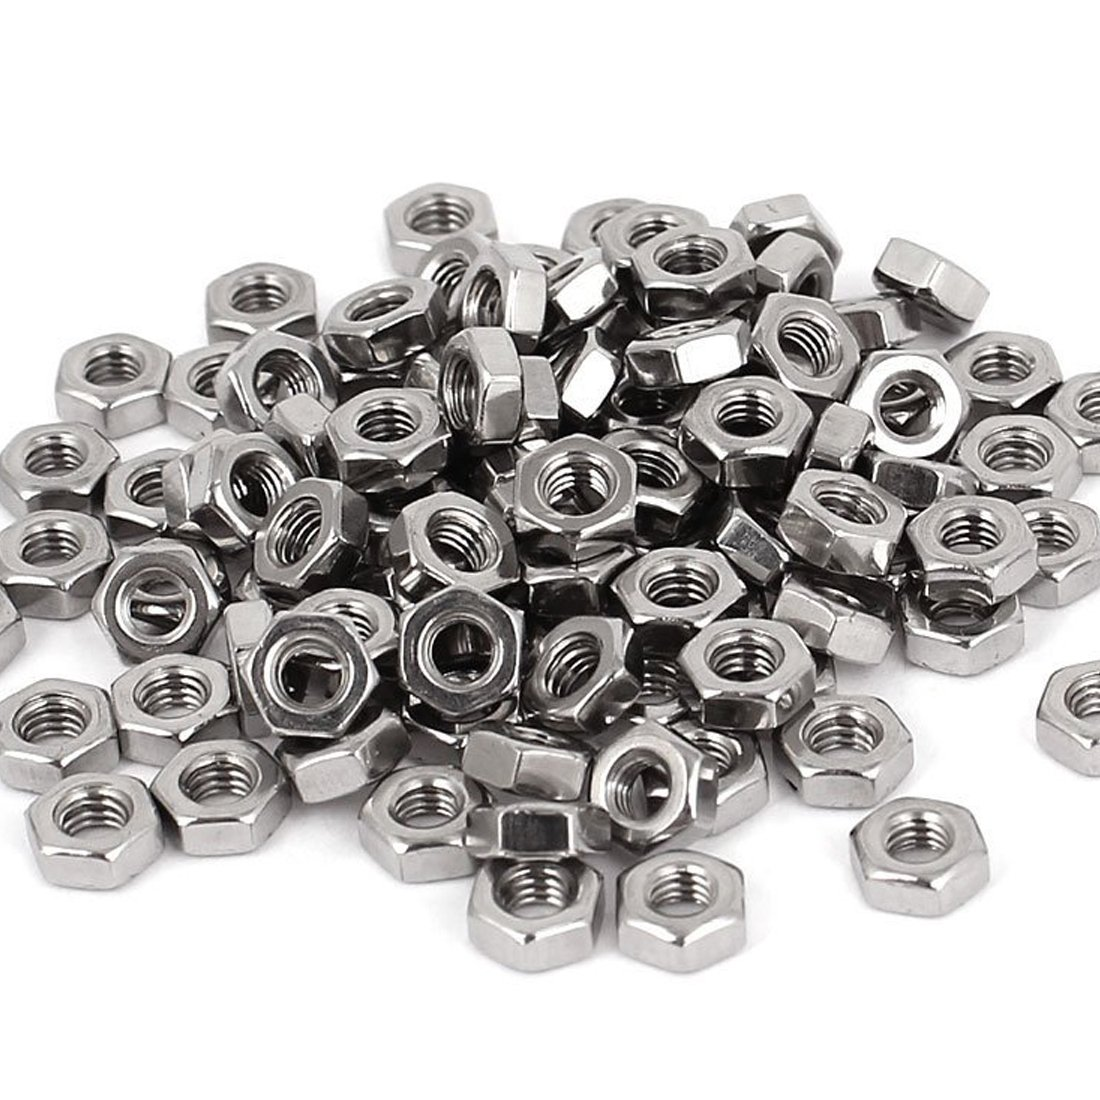 R Tuerca hexagonal 100pzs M3 3mm Sujetador tuerca de metal hexagonal de rosca hembra Tono de plata SODIAL